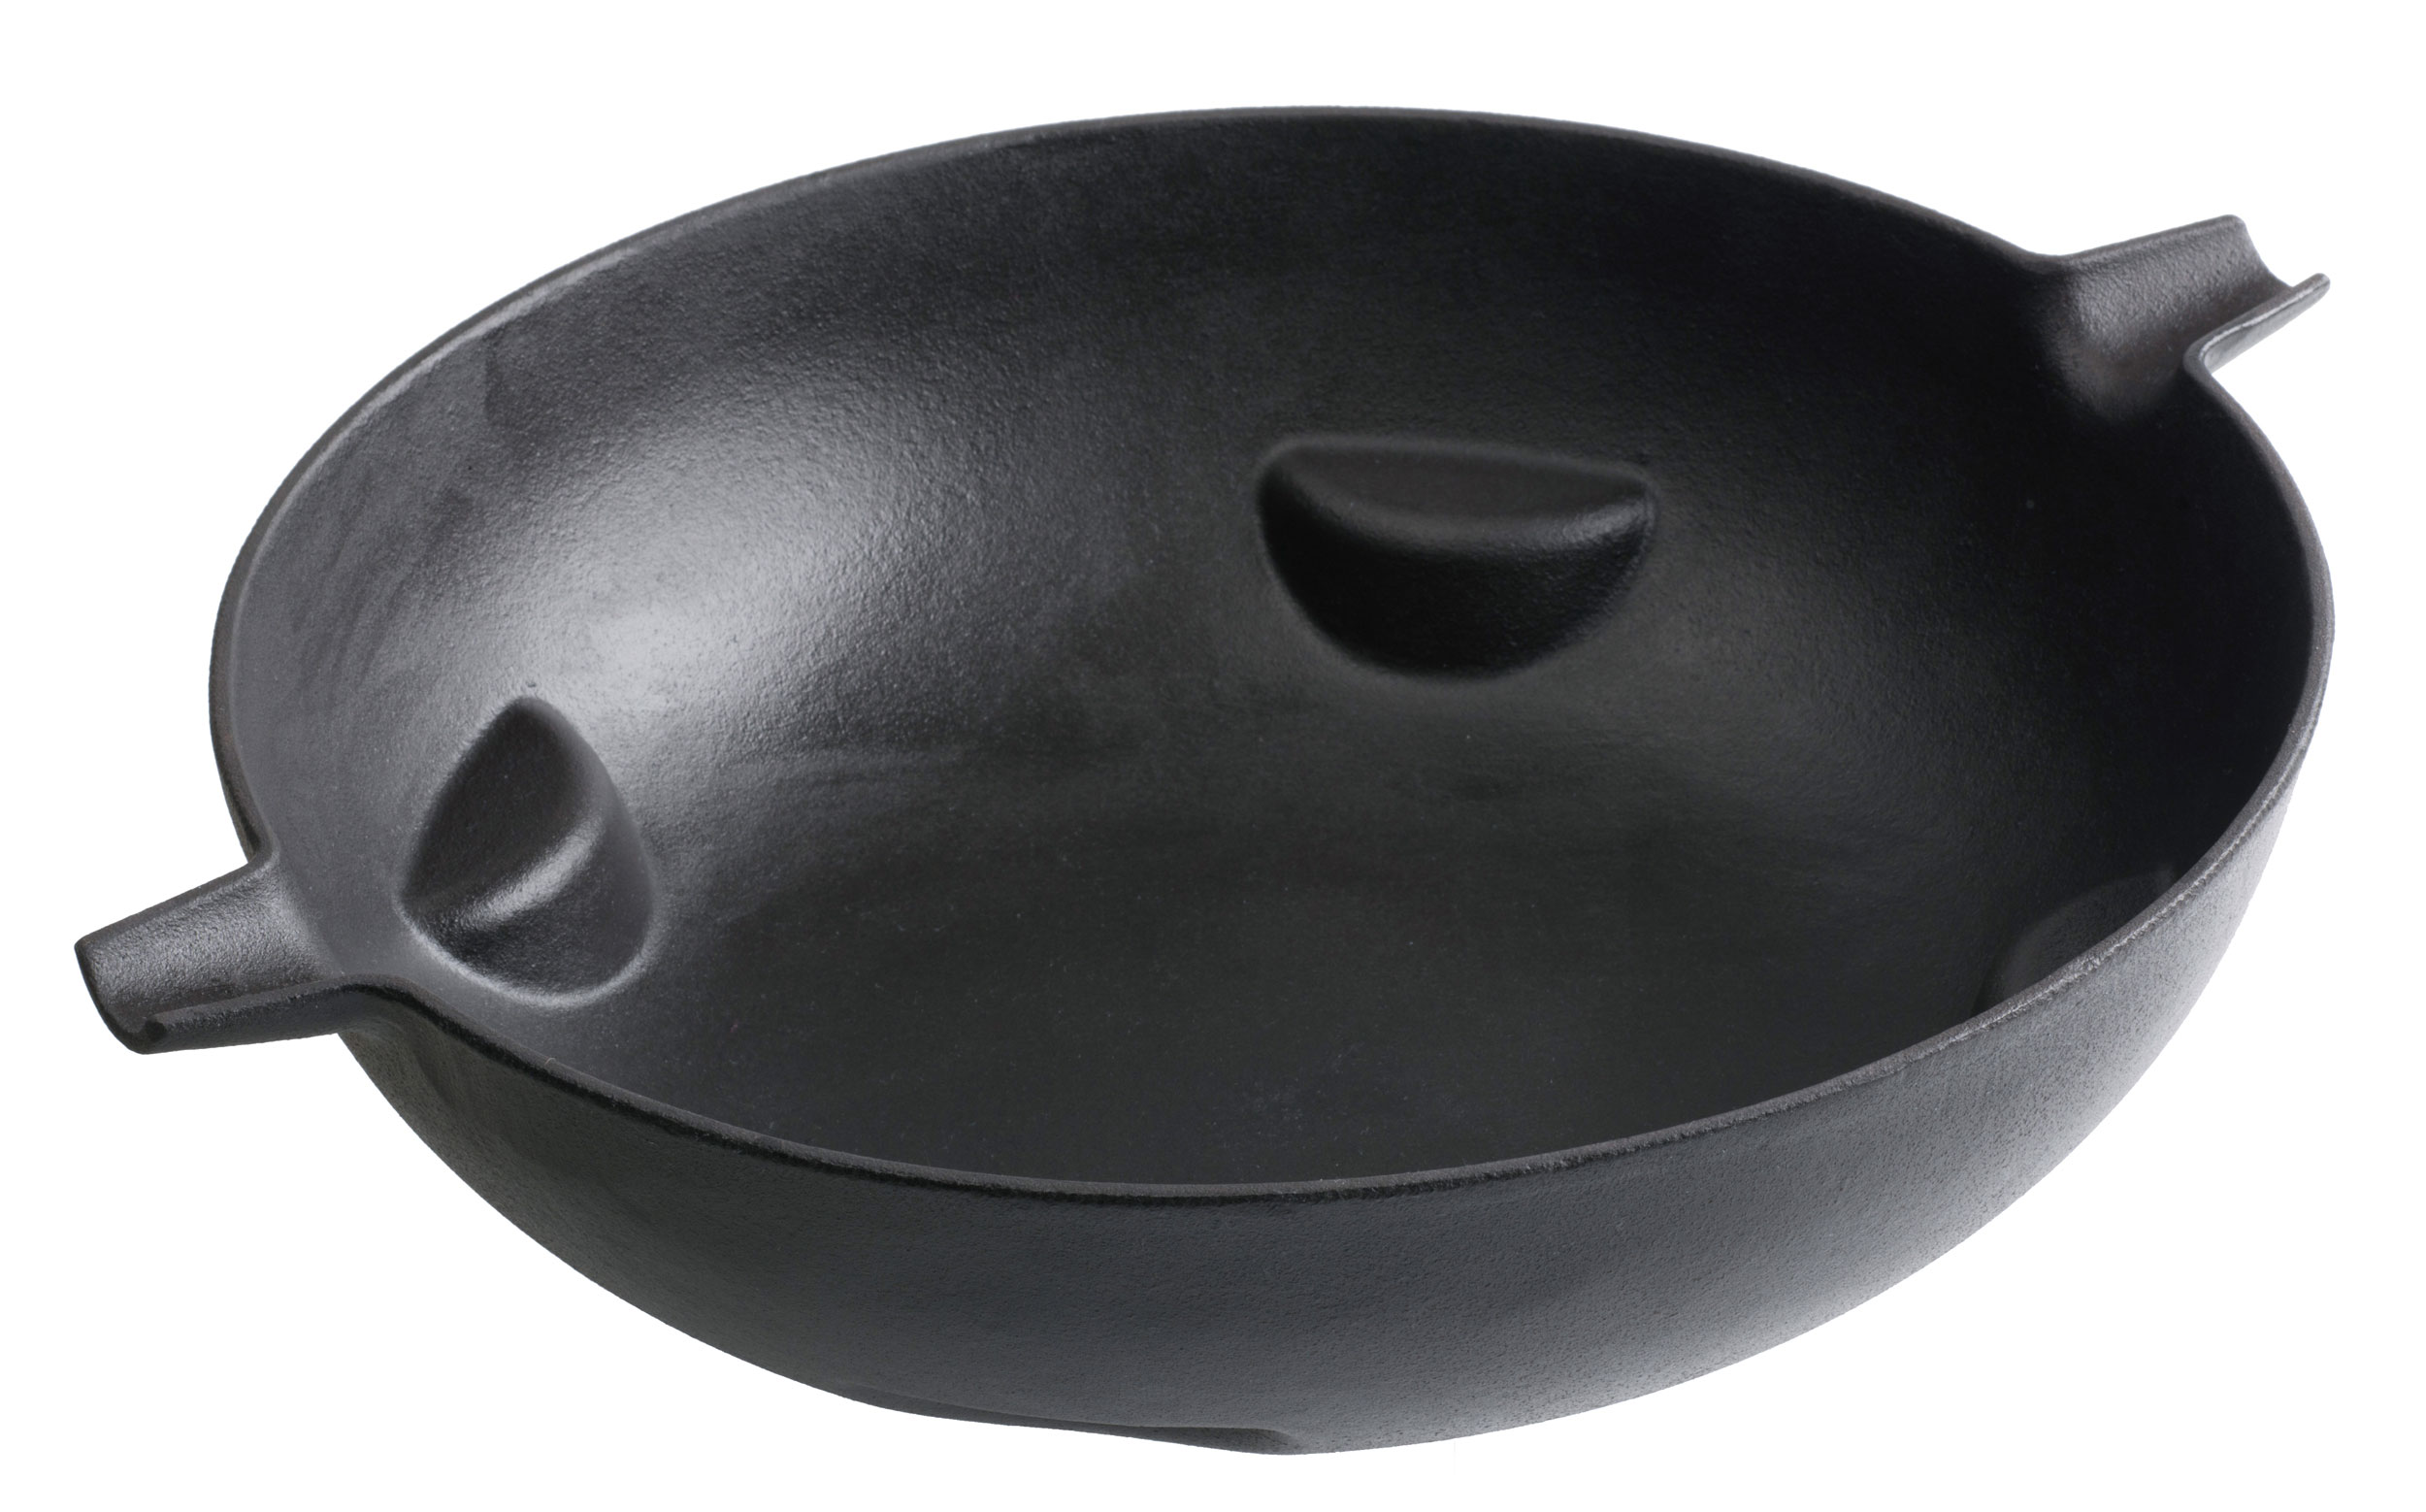 Enders Gasgrill Wok : Tepro guss wok einleger grillrost Ø cm bei edingershops